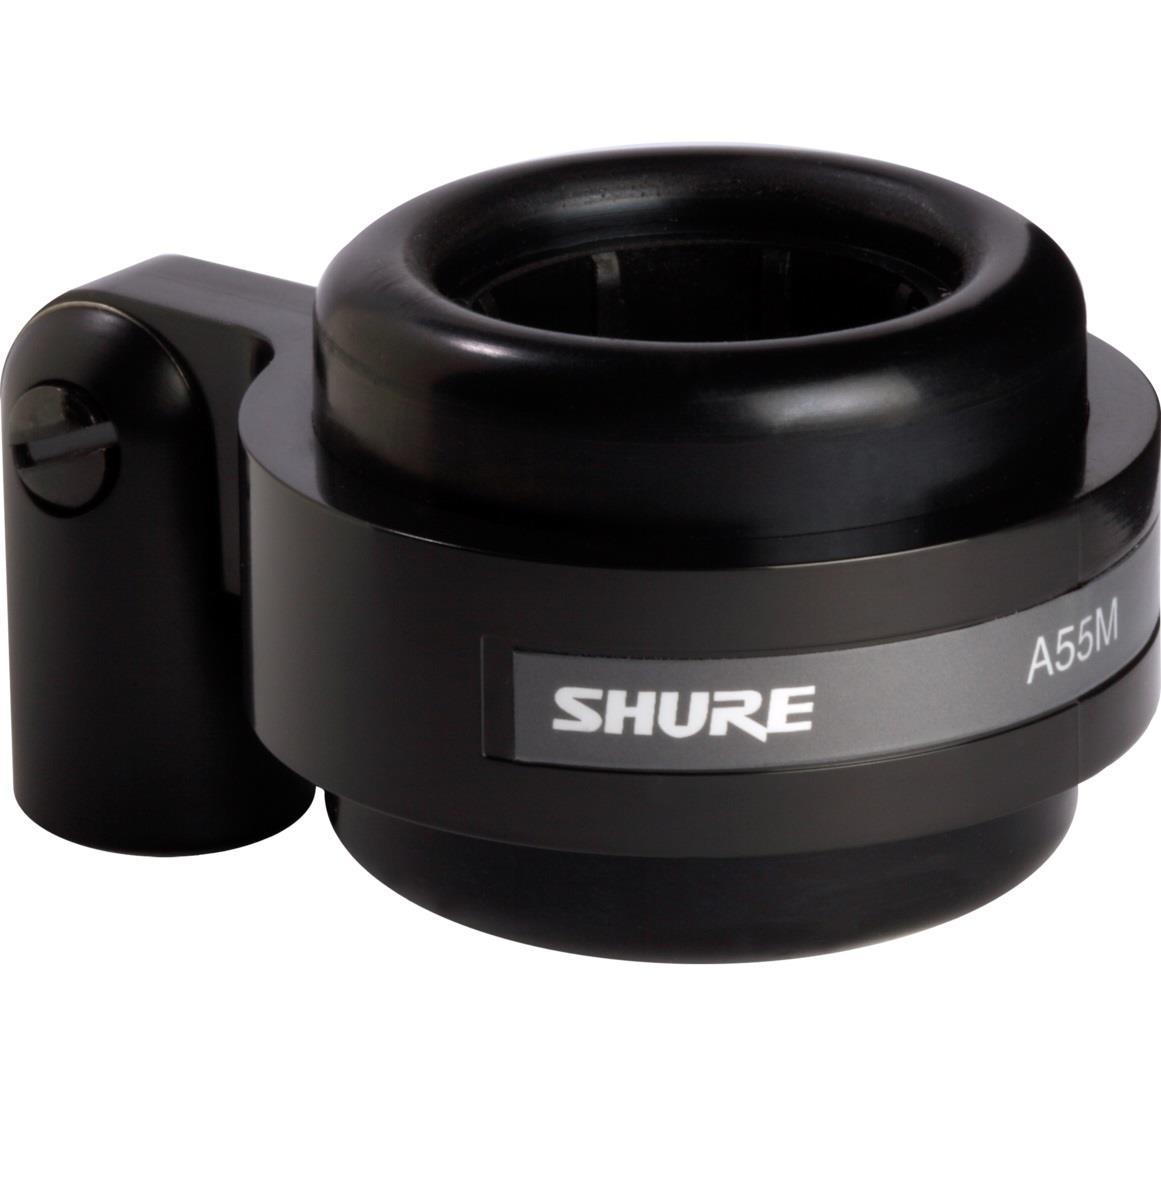 Shure isolation mount